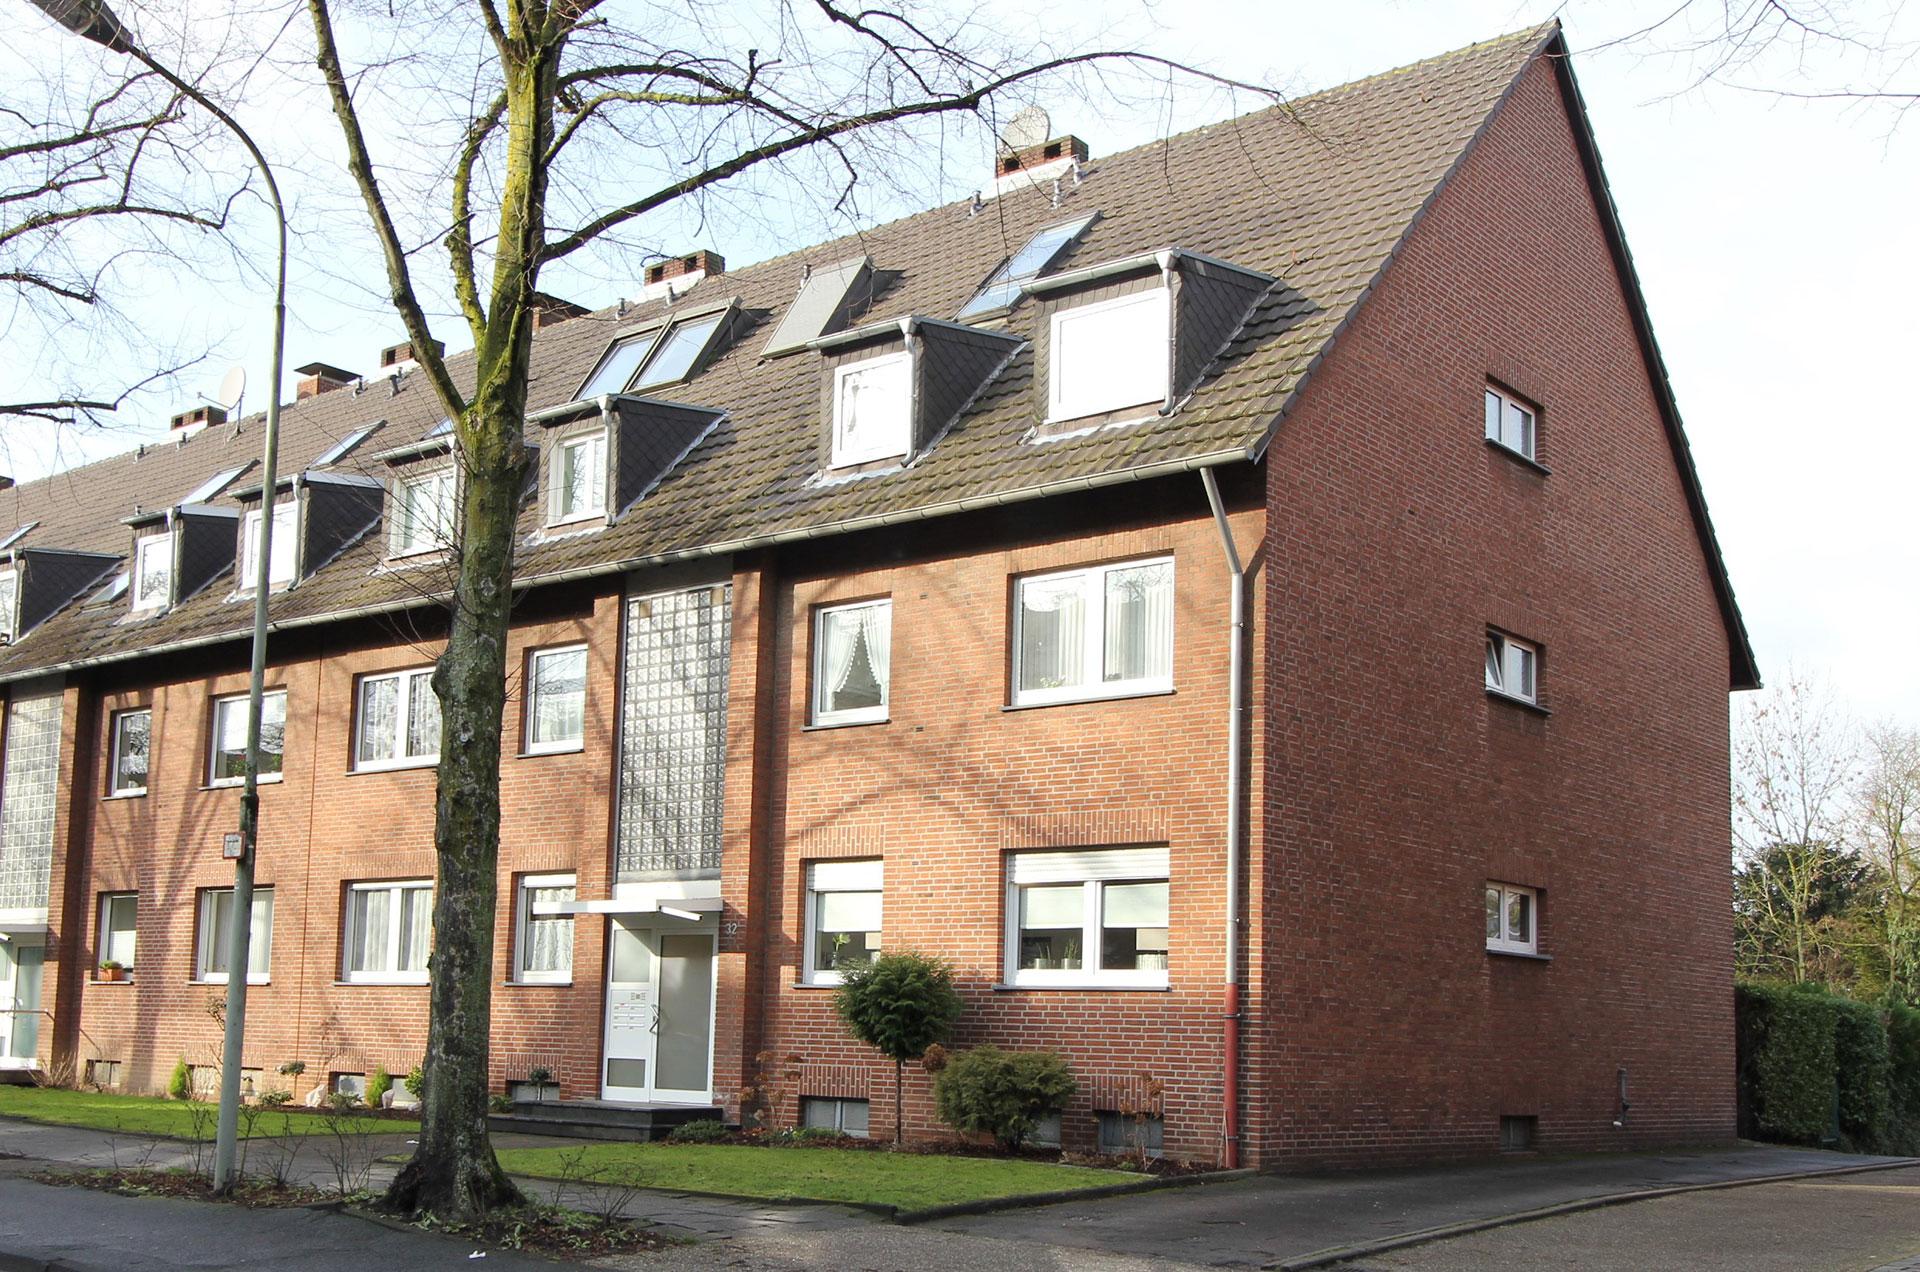 Hausverwaltung Krefeld: Bergstraße WEG-Verwalter